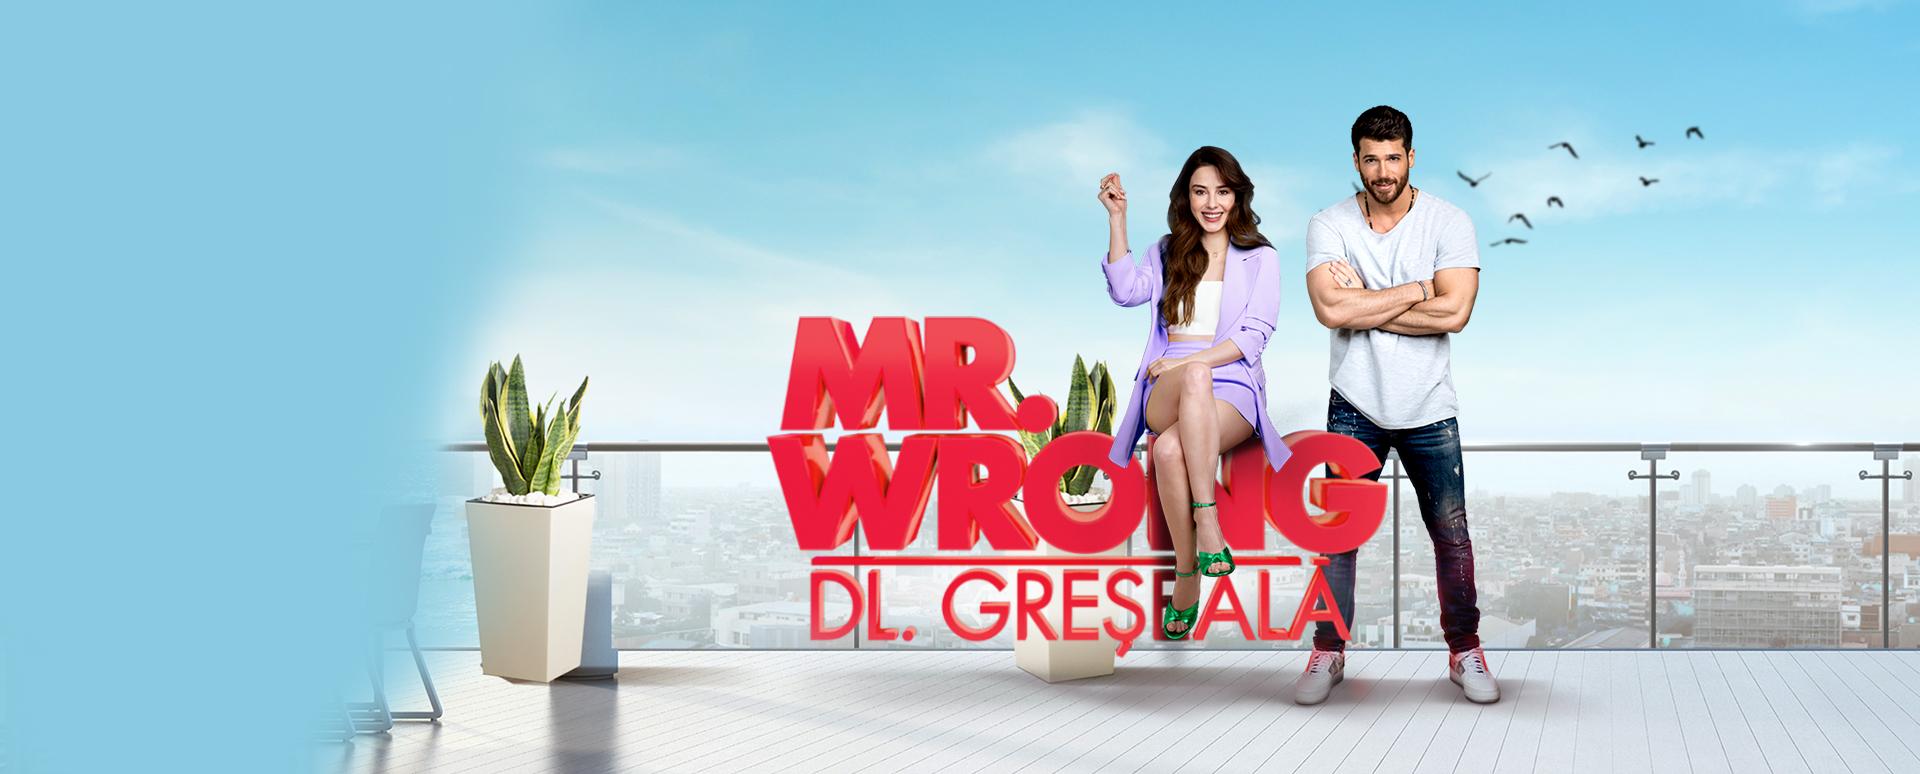 Bay Yanlis   Domnul Greseala Varianta TV